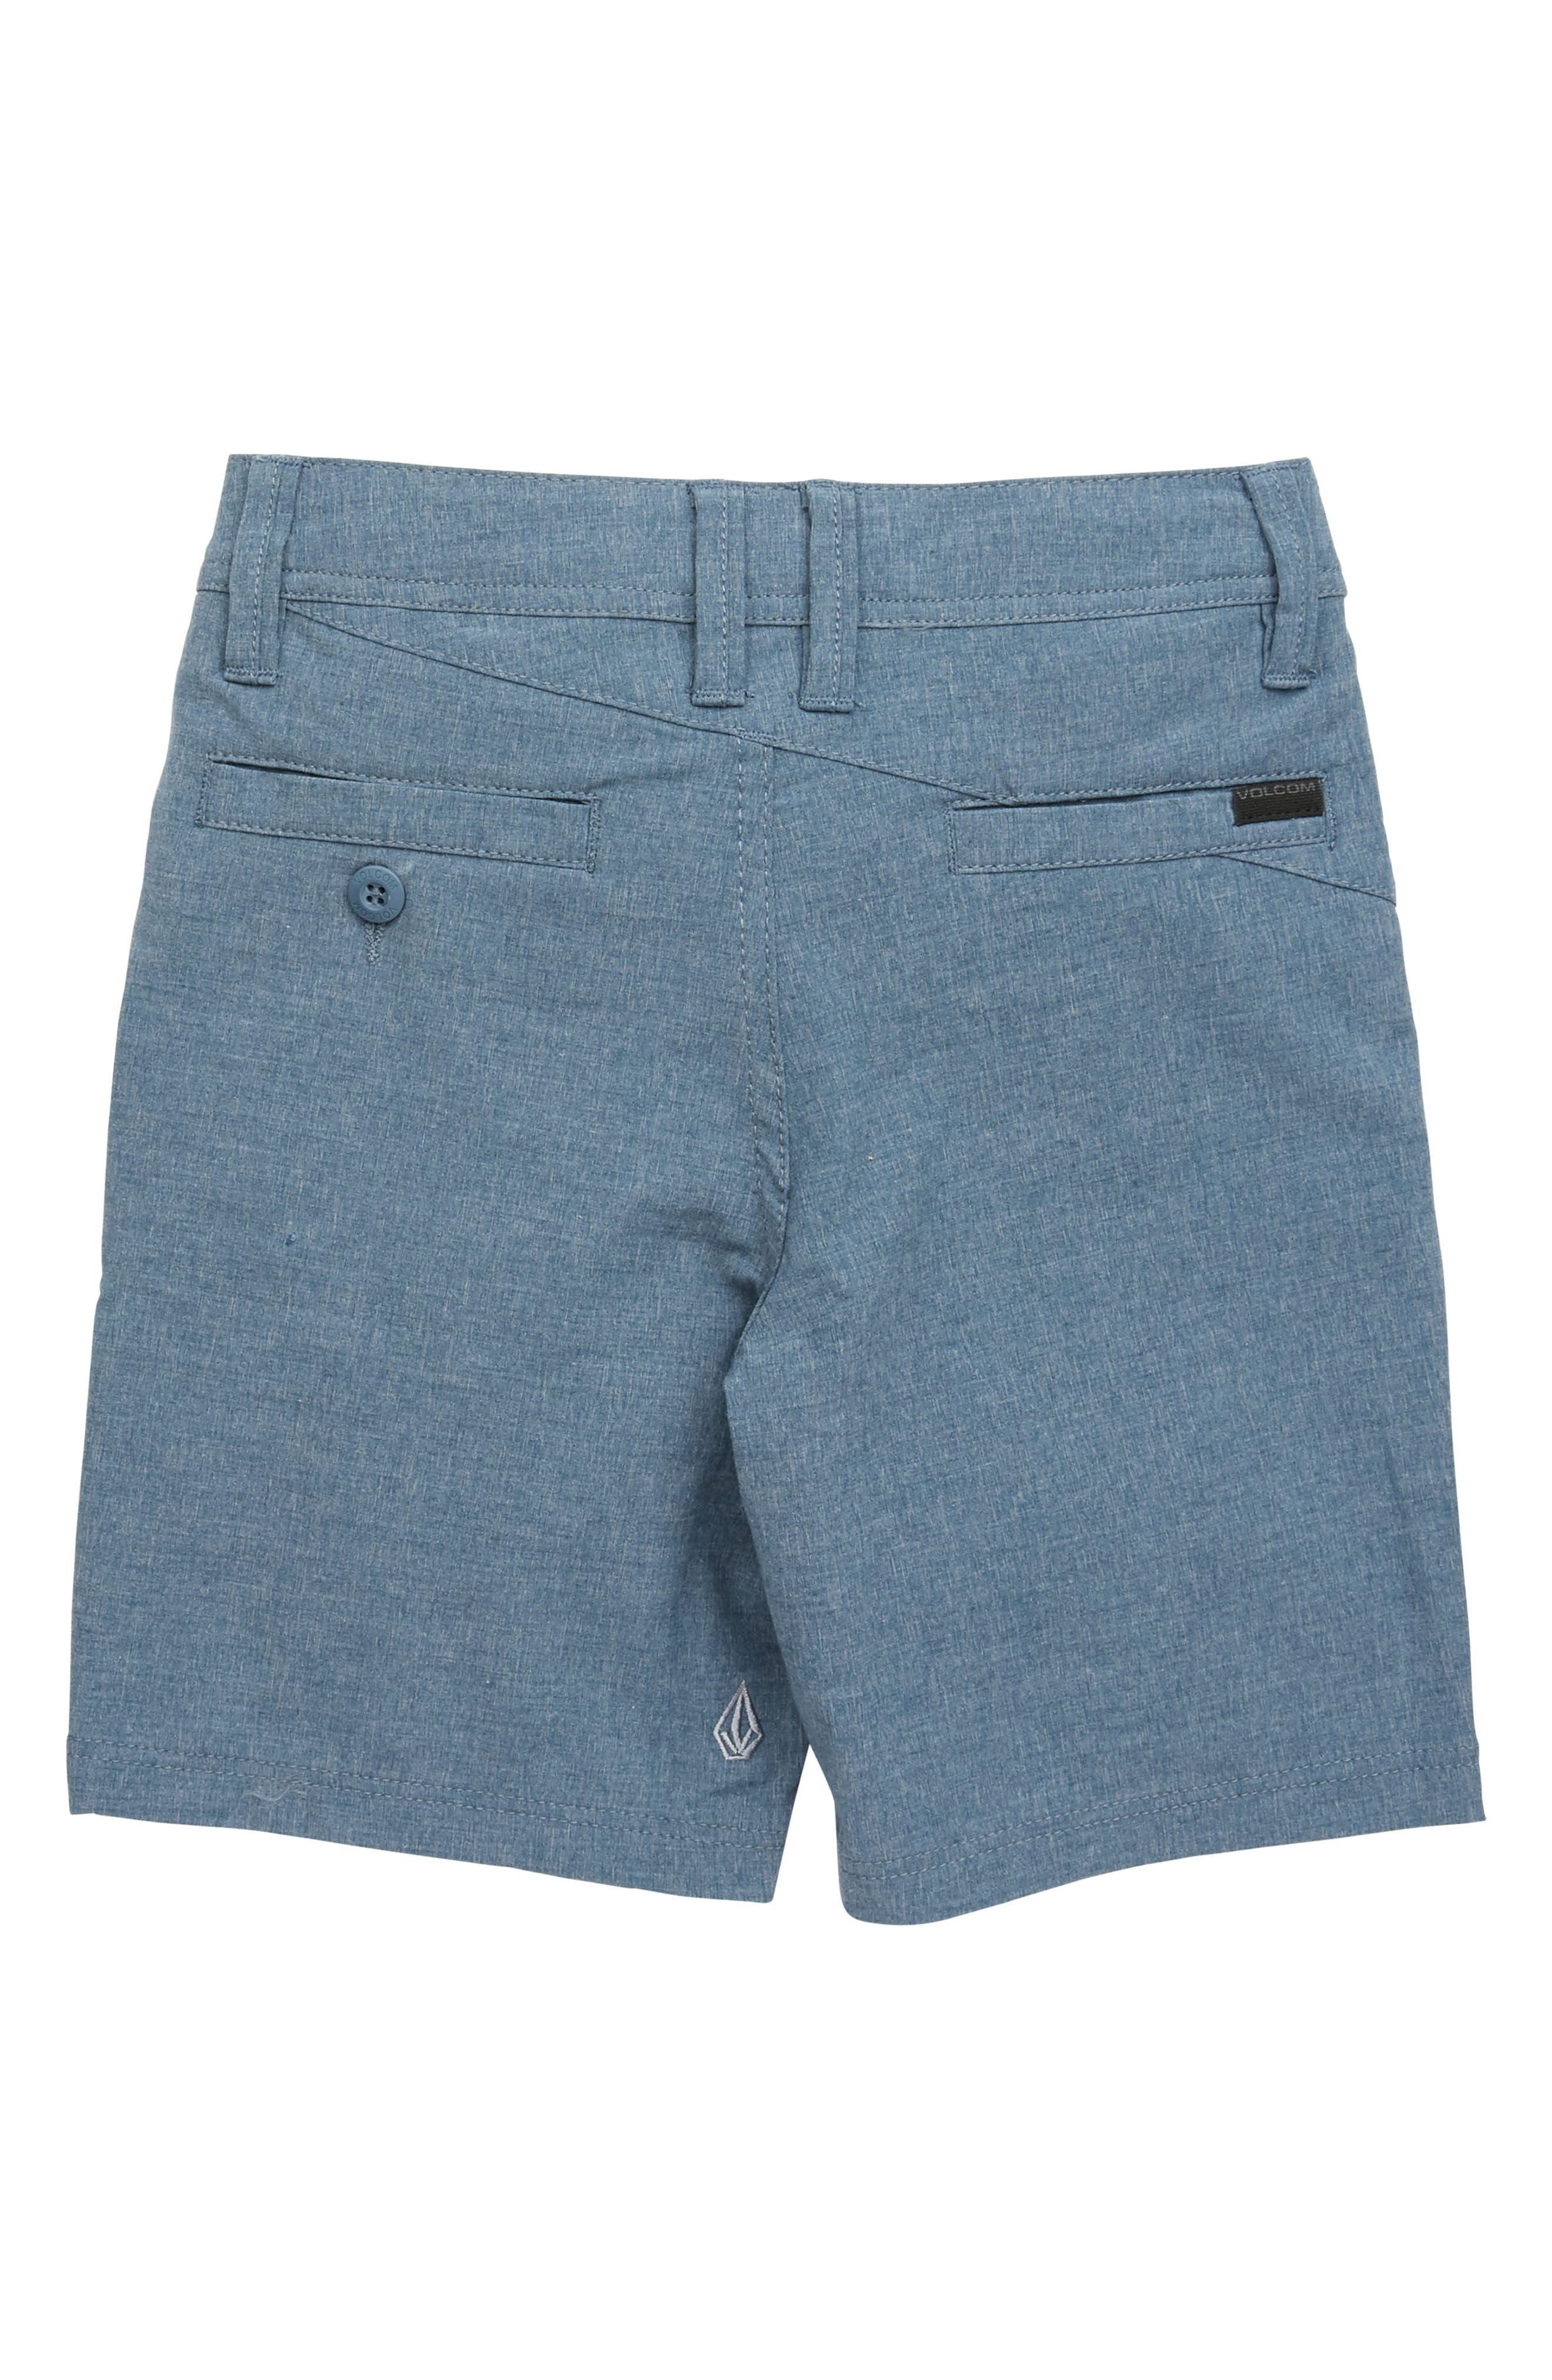 Surf N' Turf Static Hybrid Shorts,                             Alternate thumbnail 2, color,                             Deep Blue